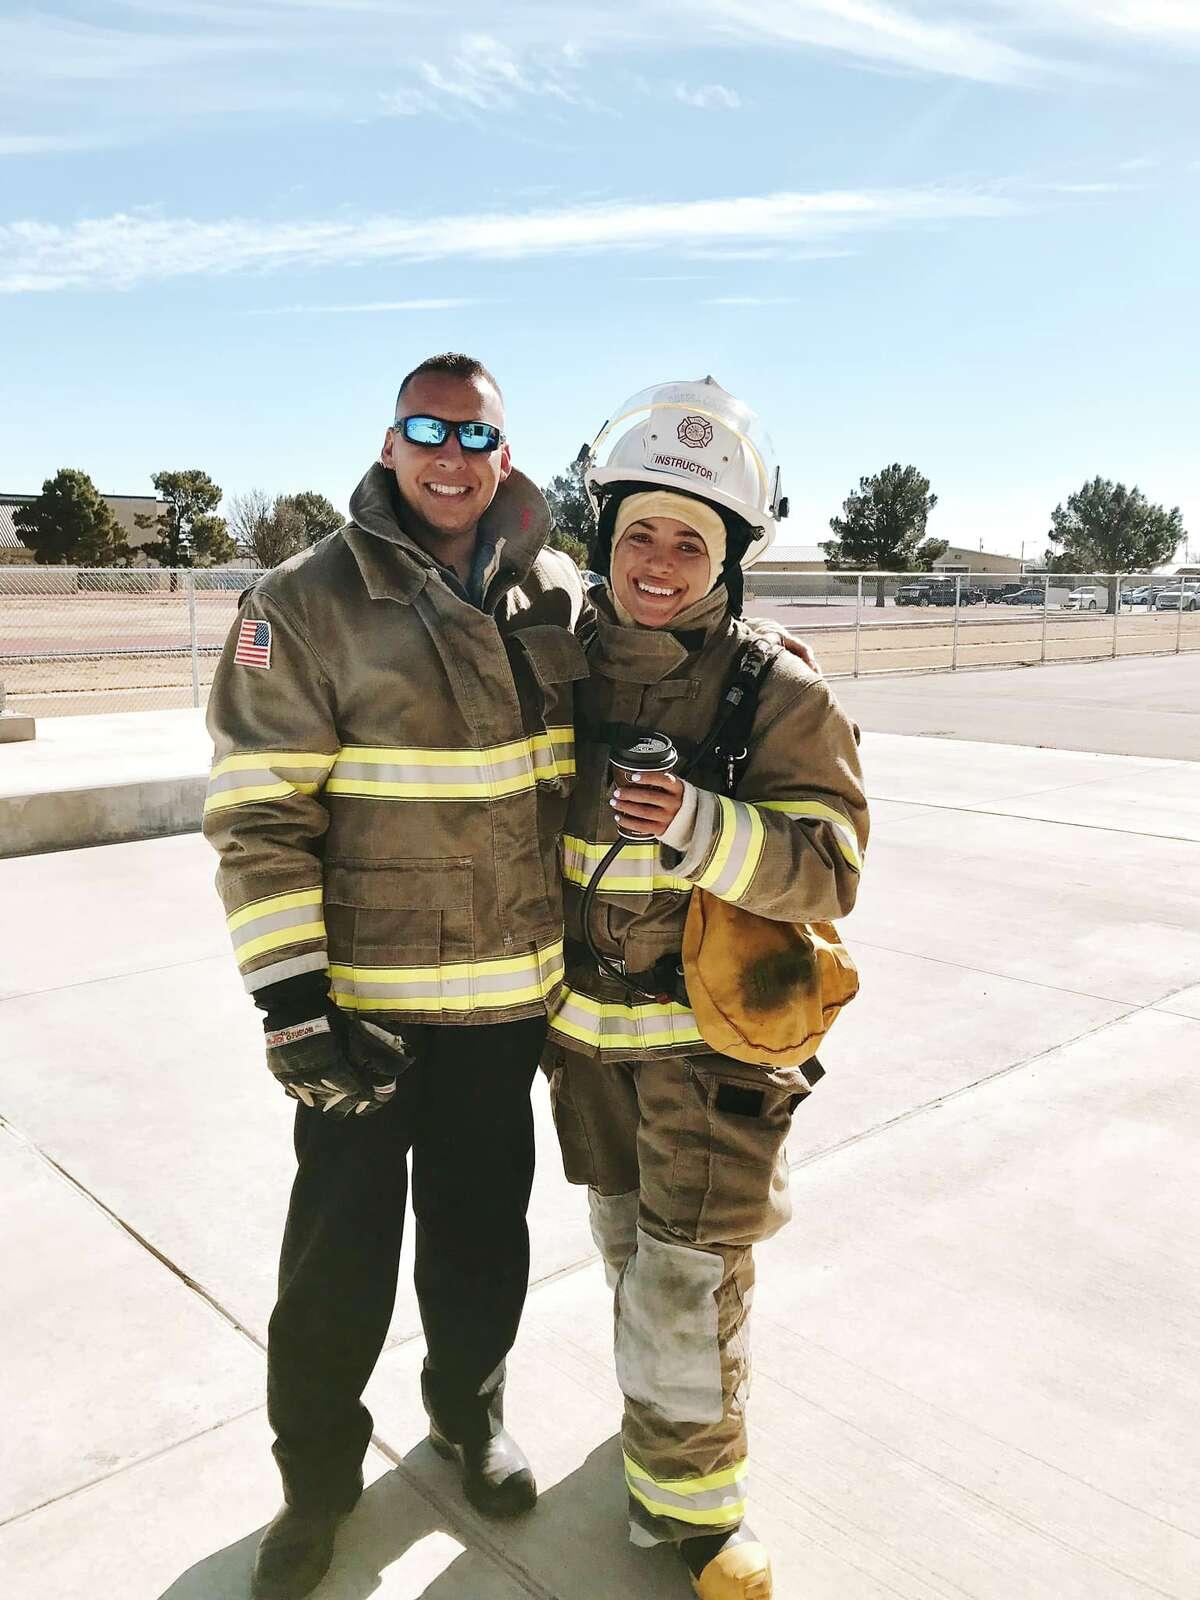 Clarke and her fiancé in firefighter gear.